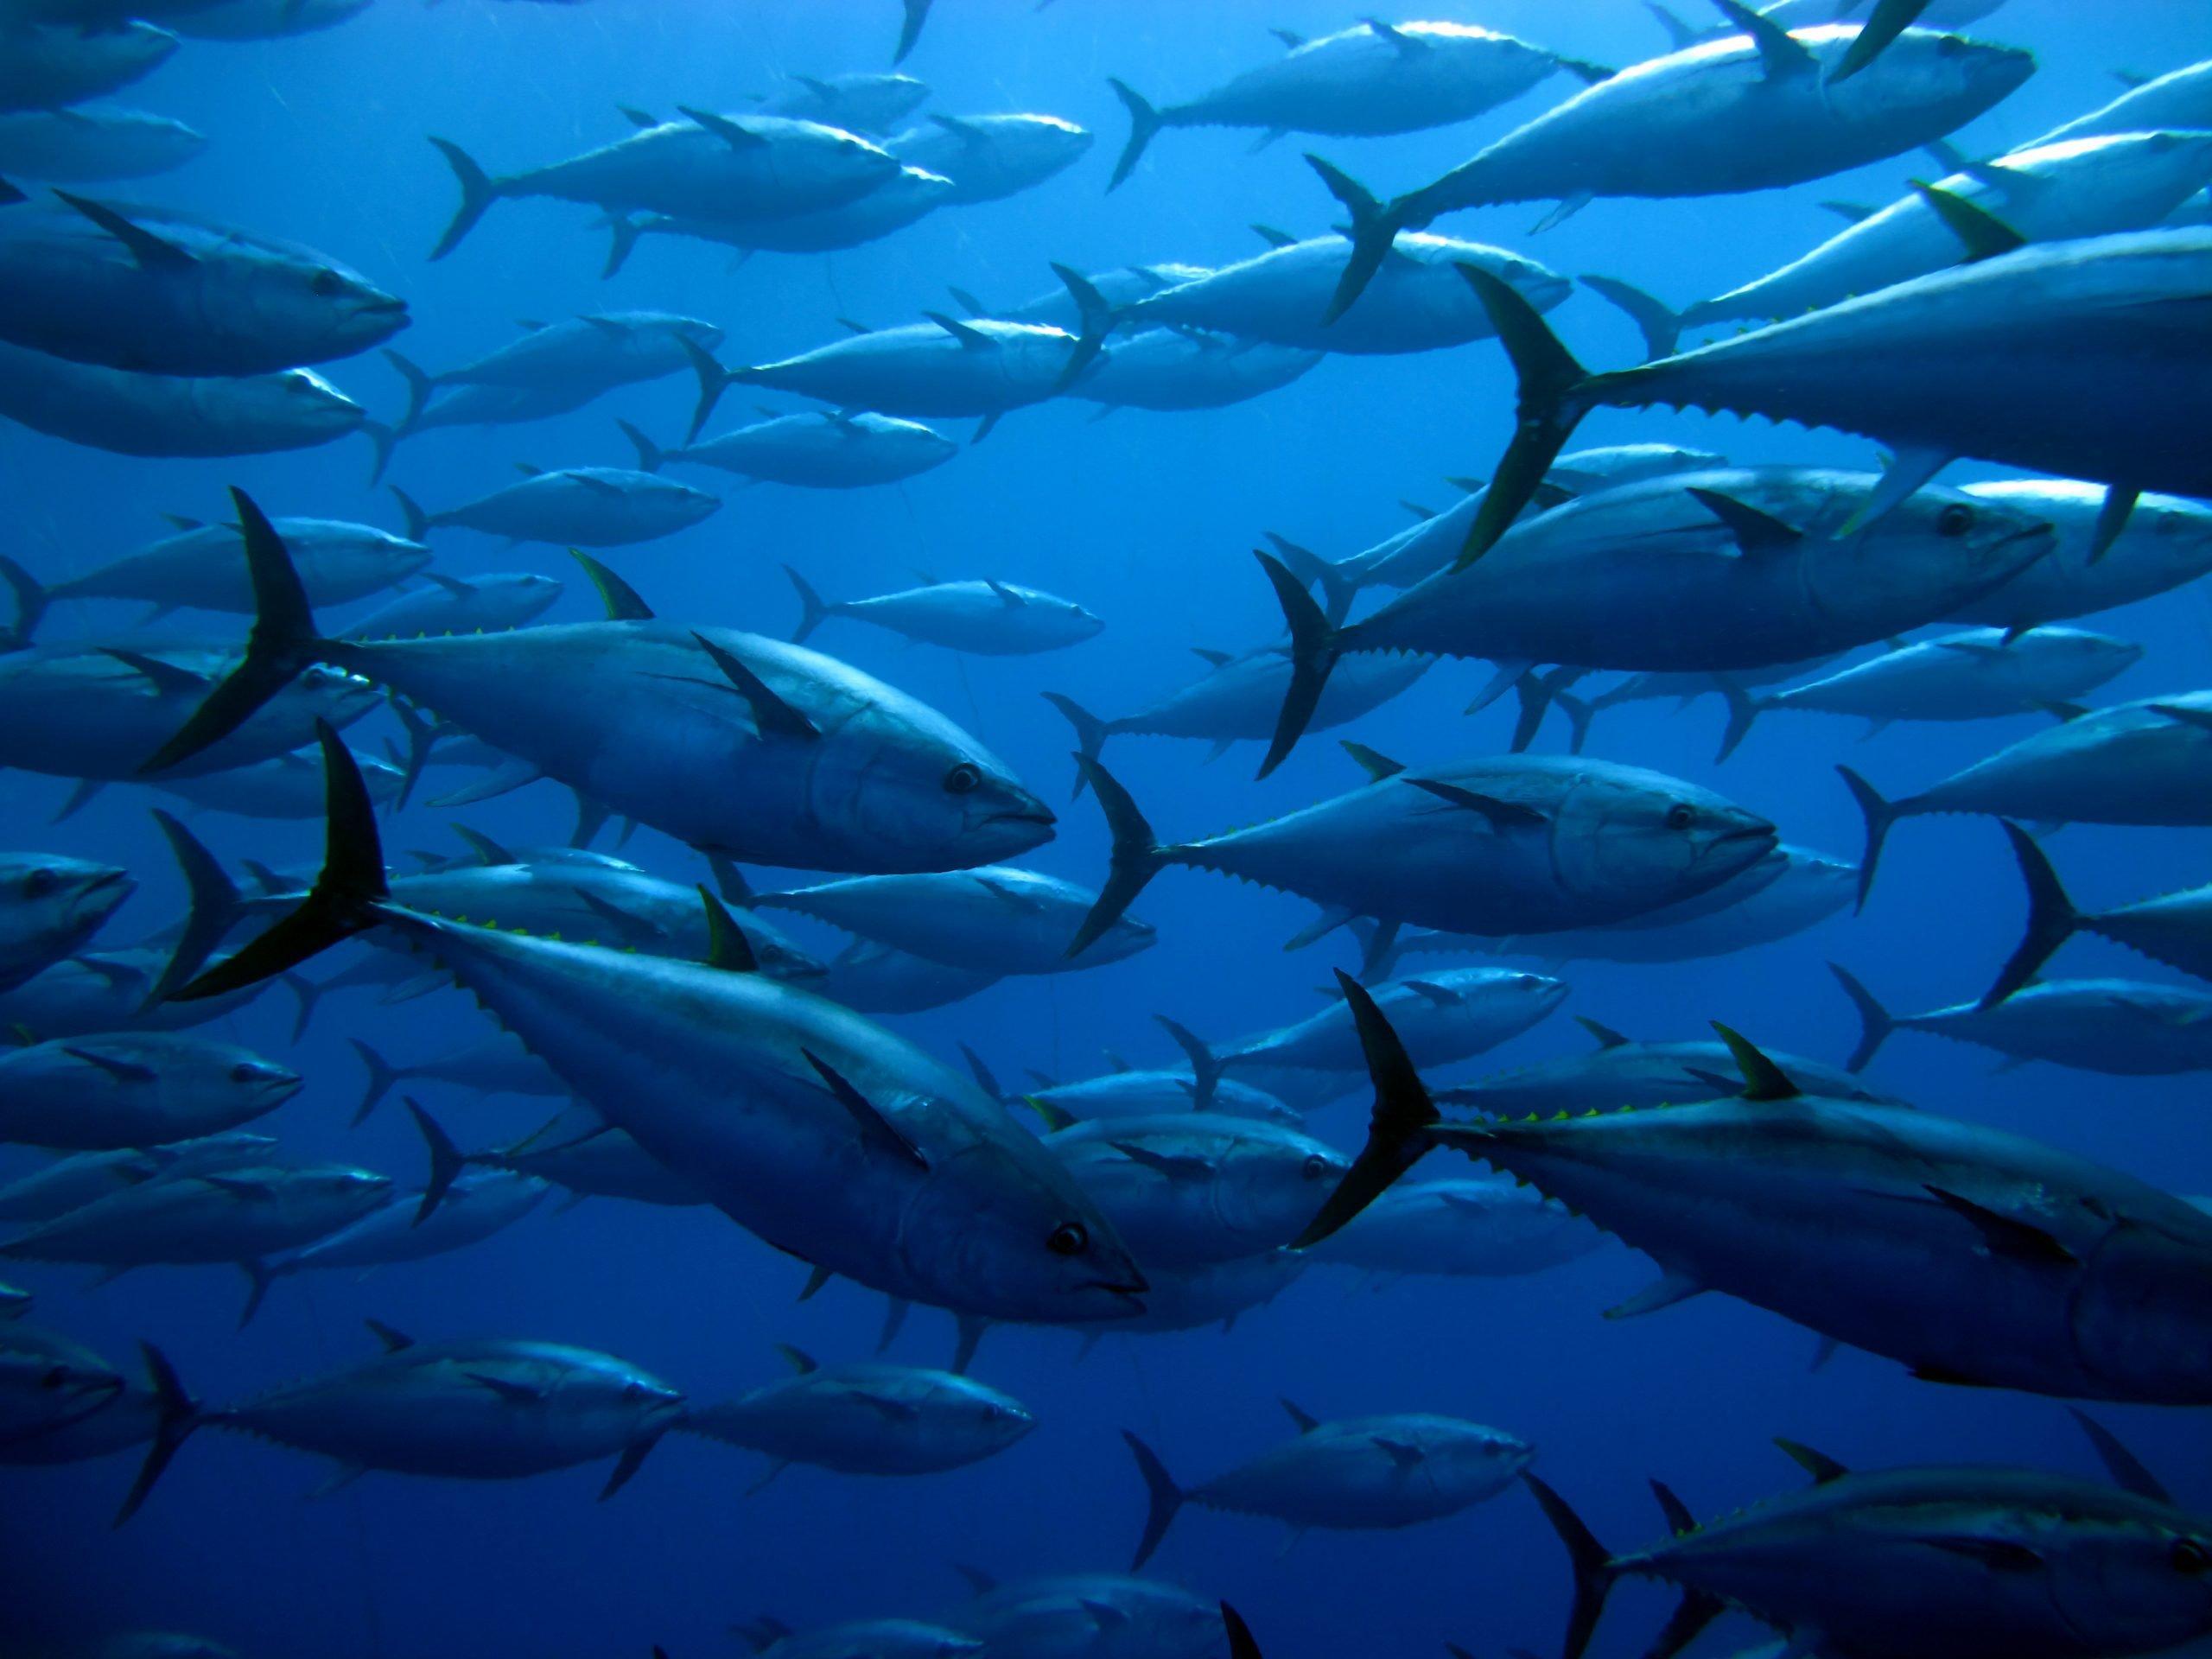 short pectoral fins on bluefin tuna